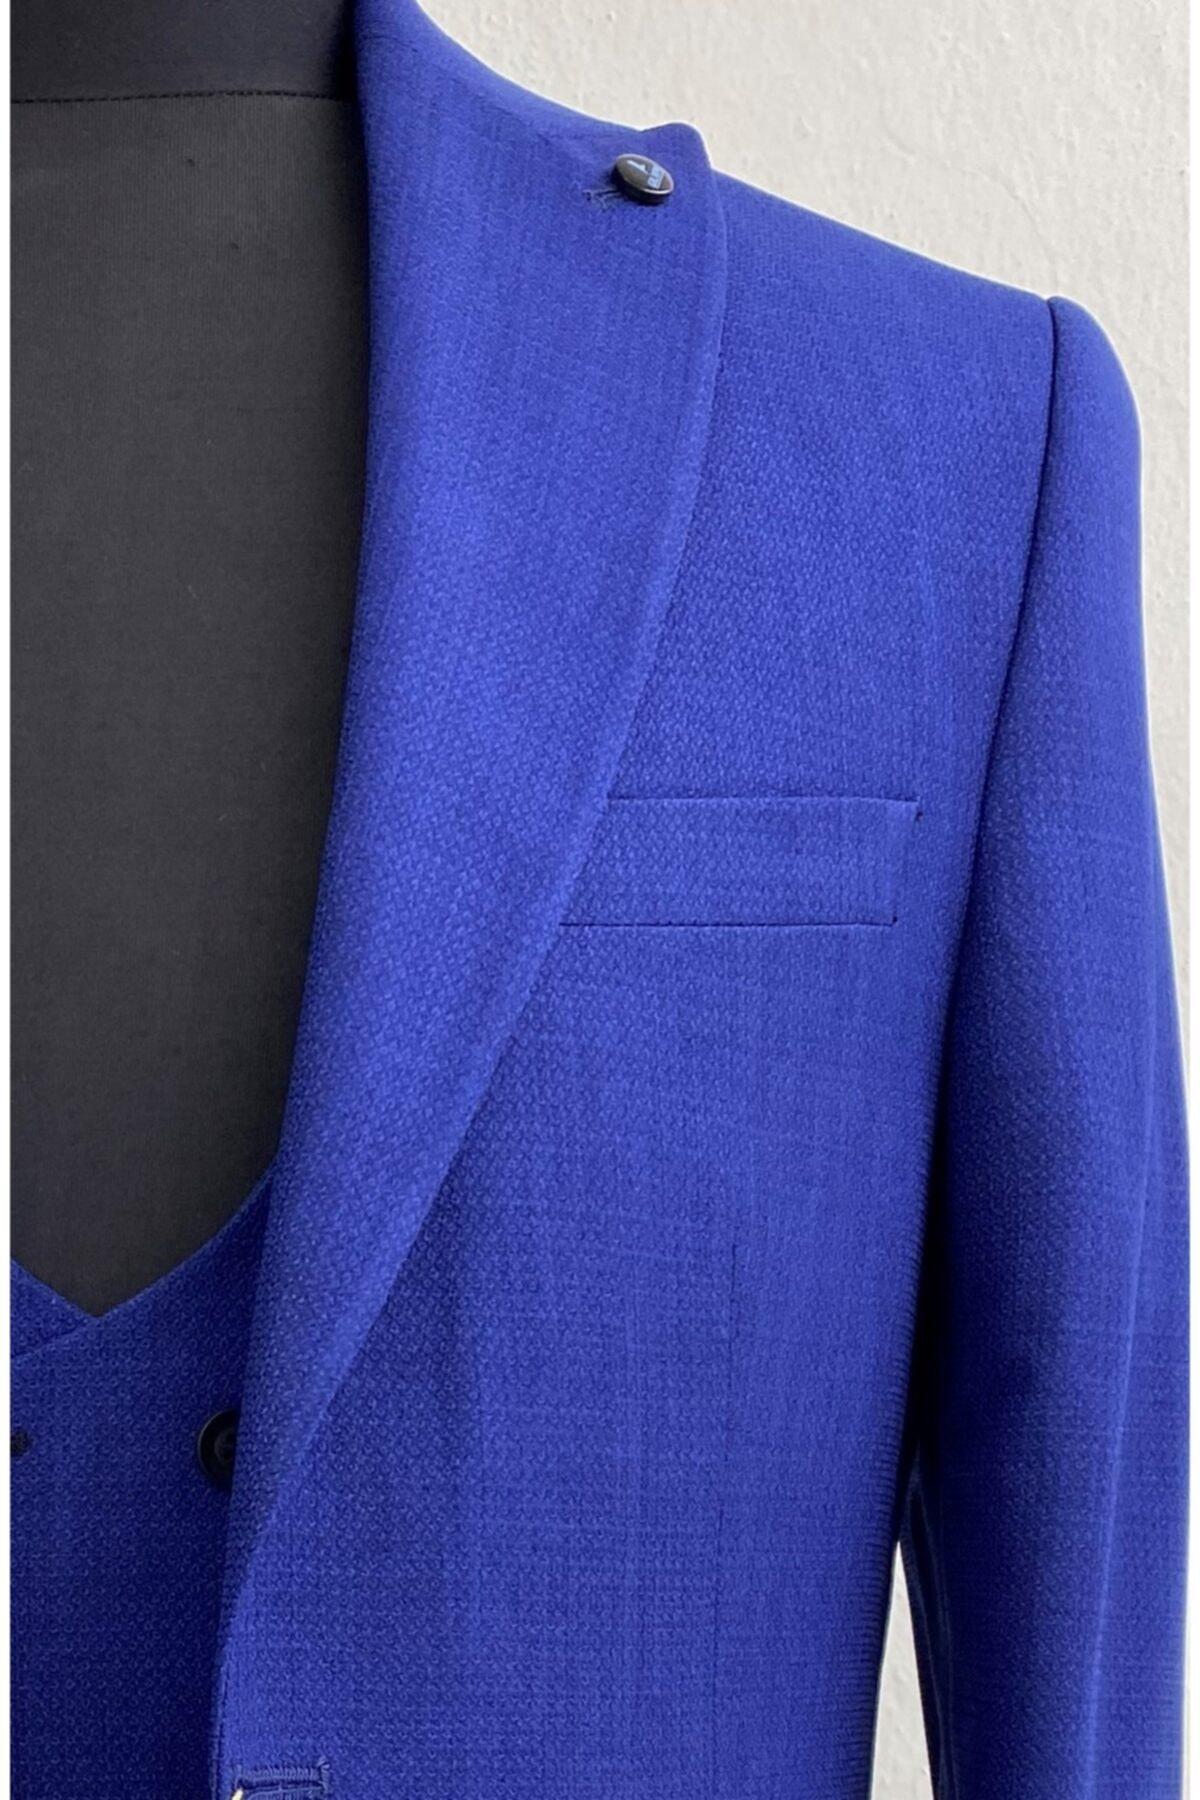 کت شلوار مردانه کوتاه برند GILAPA ÖZSARAN رنگ آبی کد ty69375941